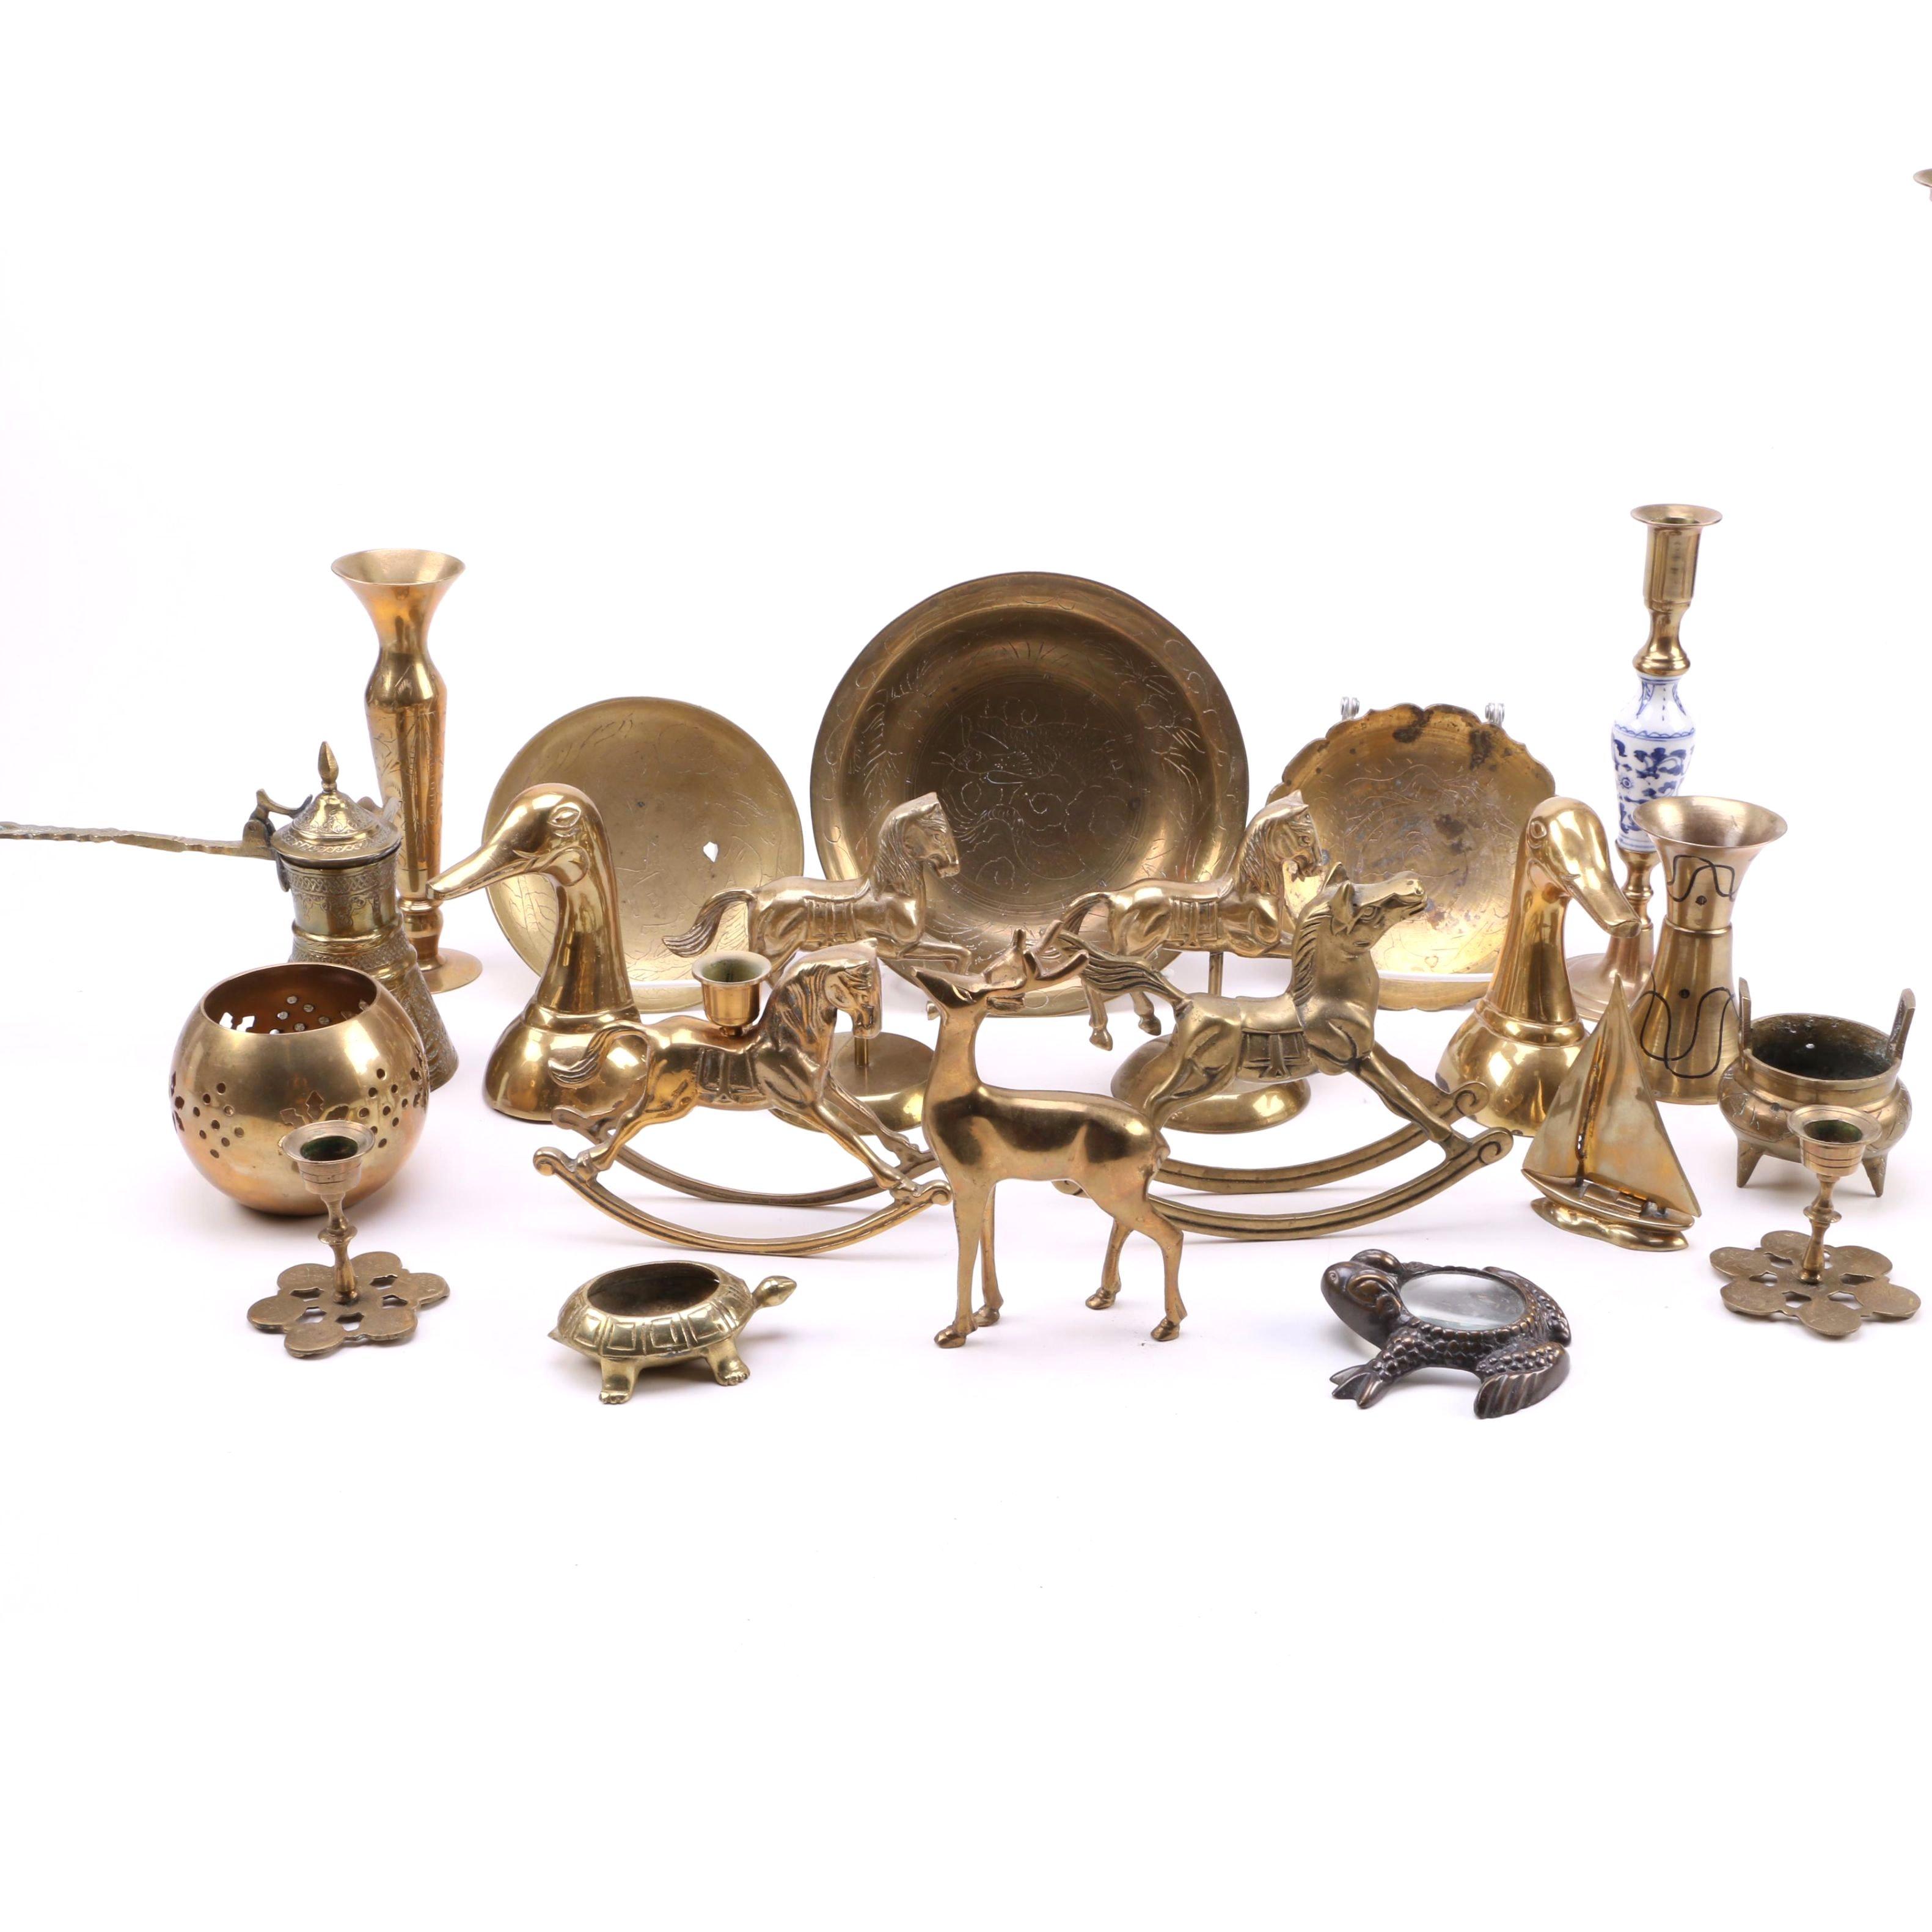 Large Assortment of Brass Decor